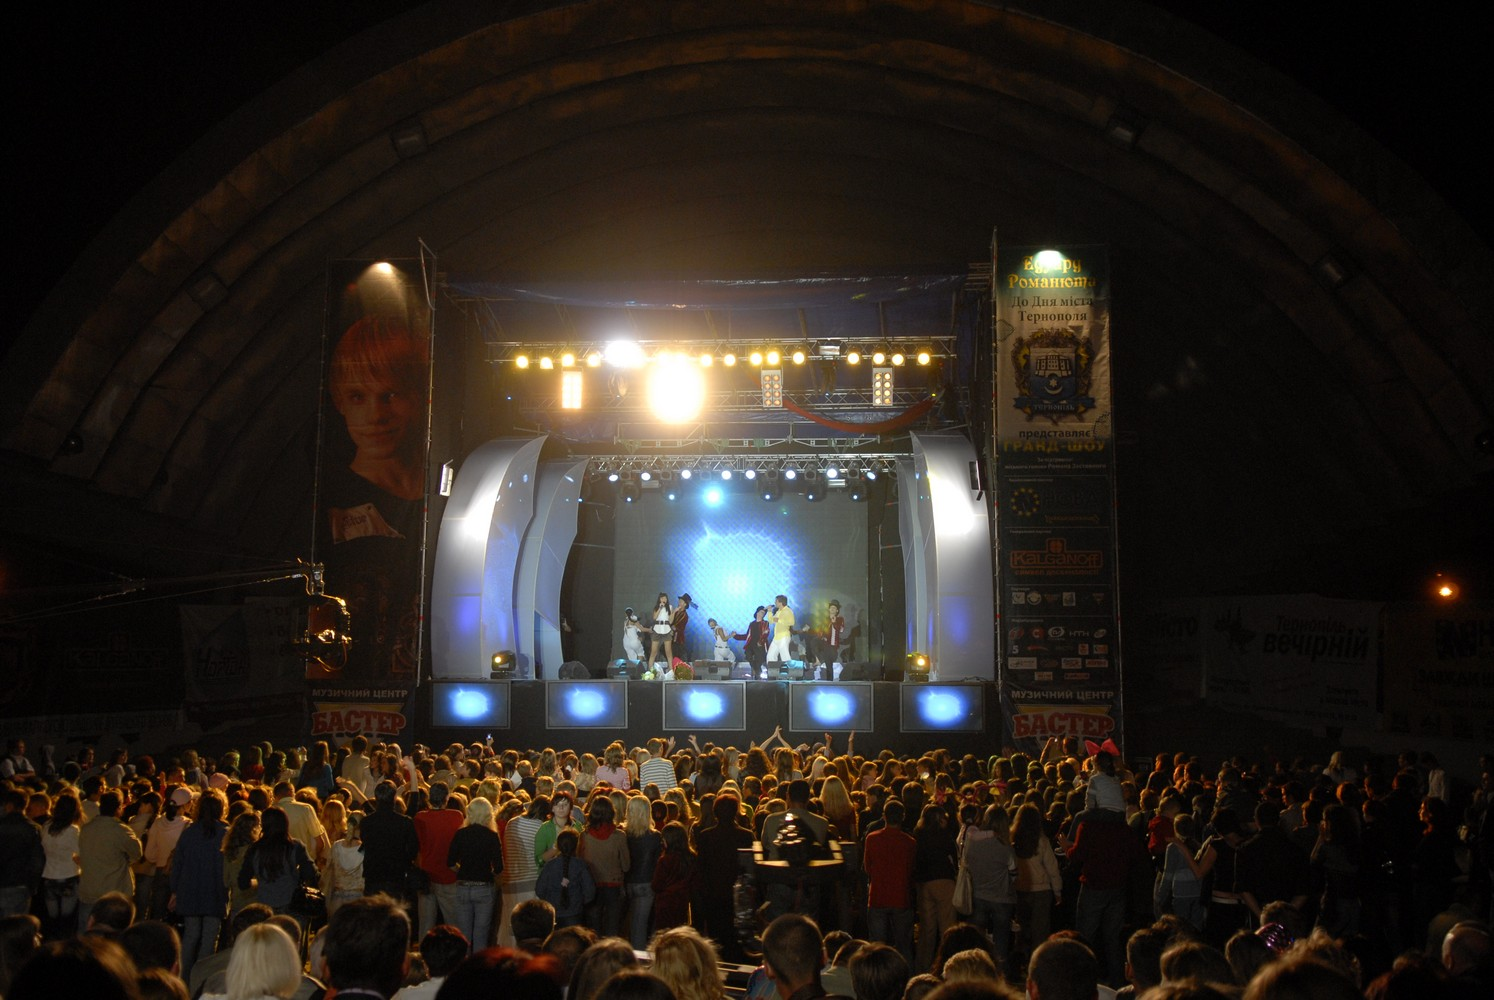 eduard-romanyuta-grand-show-2008_29